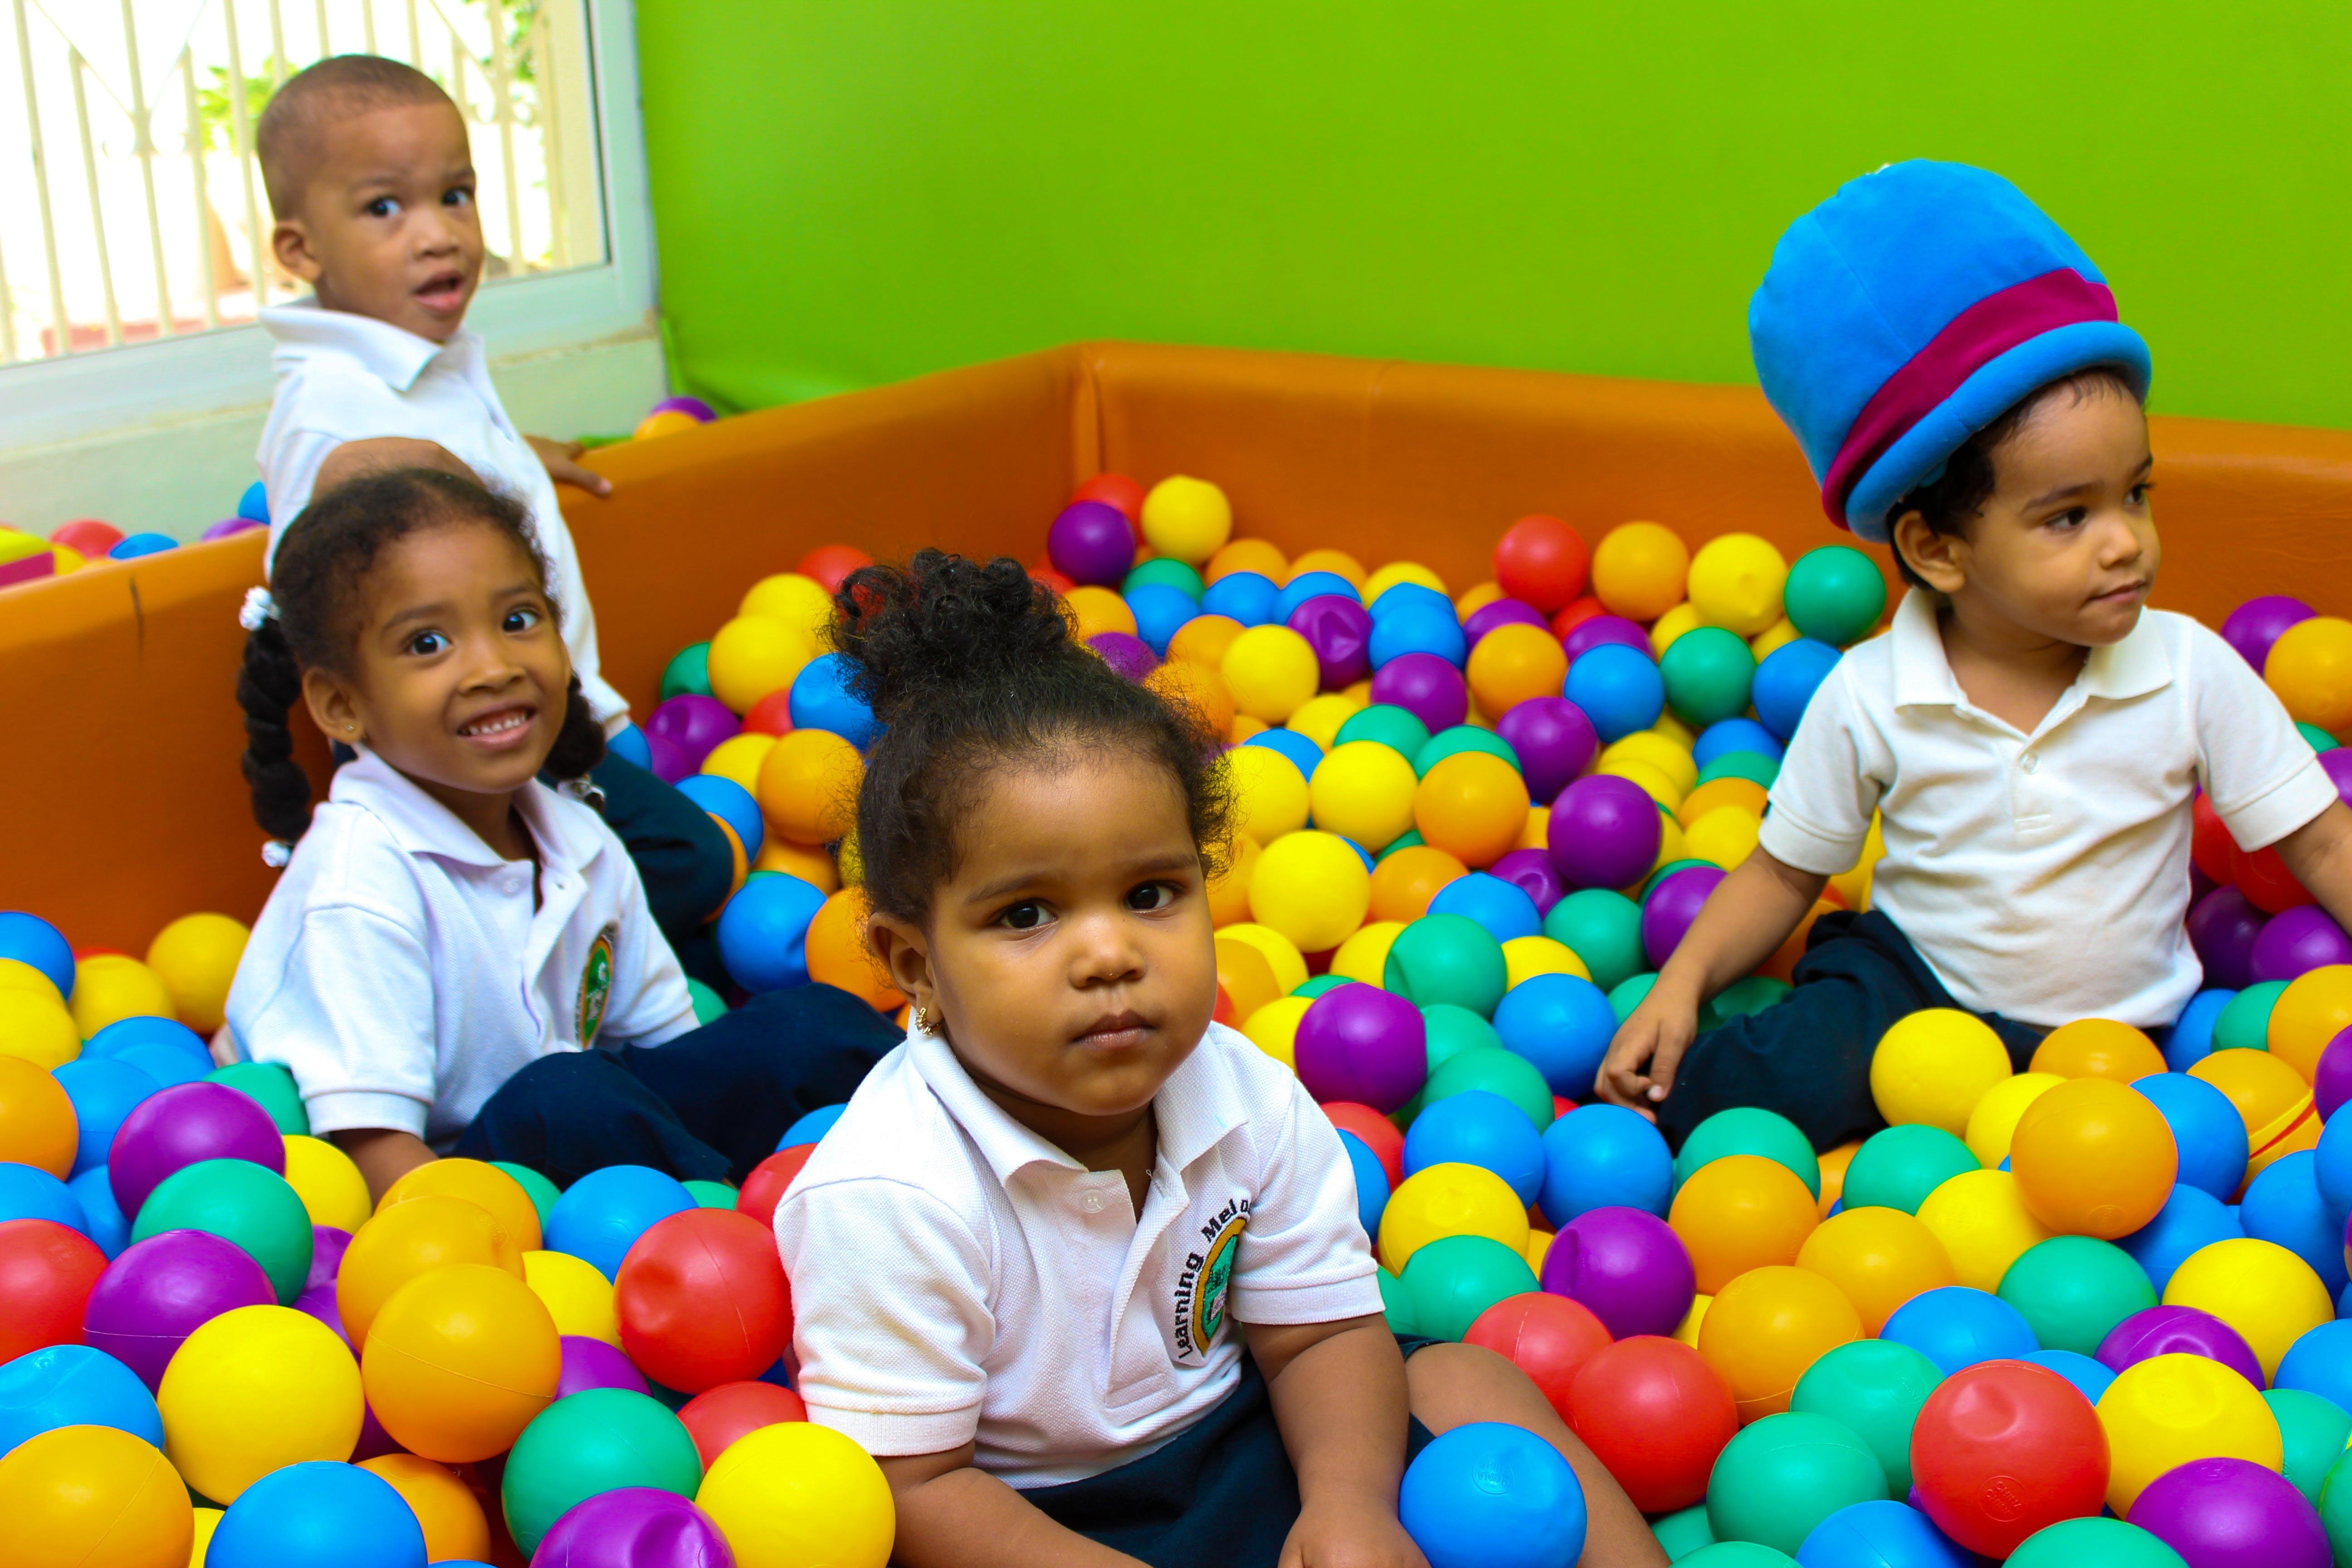 children, colors, enjoying